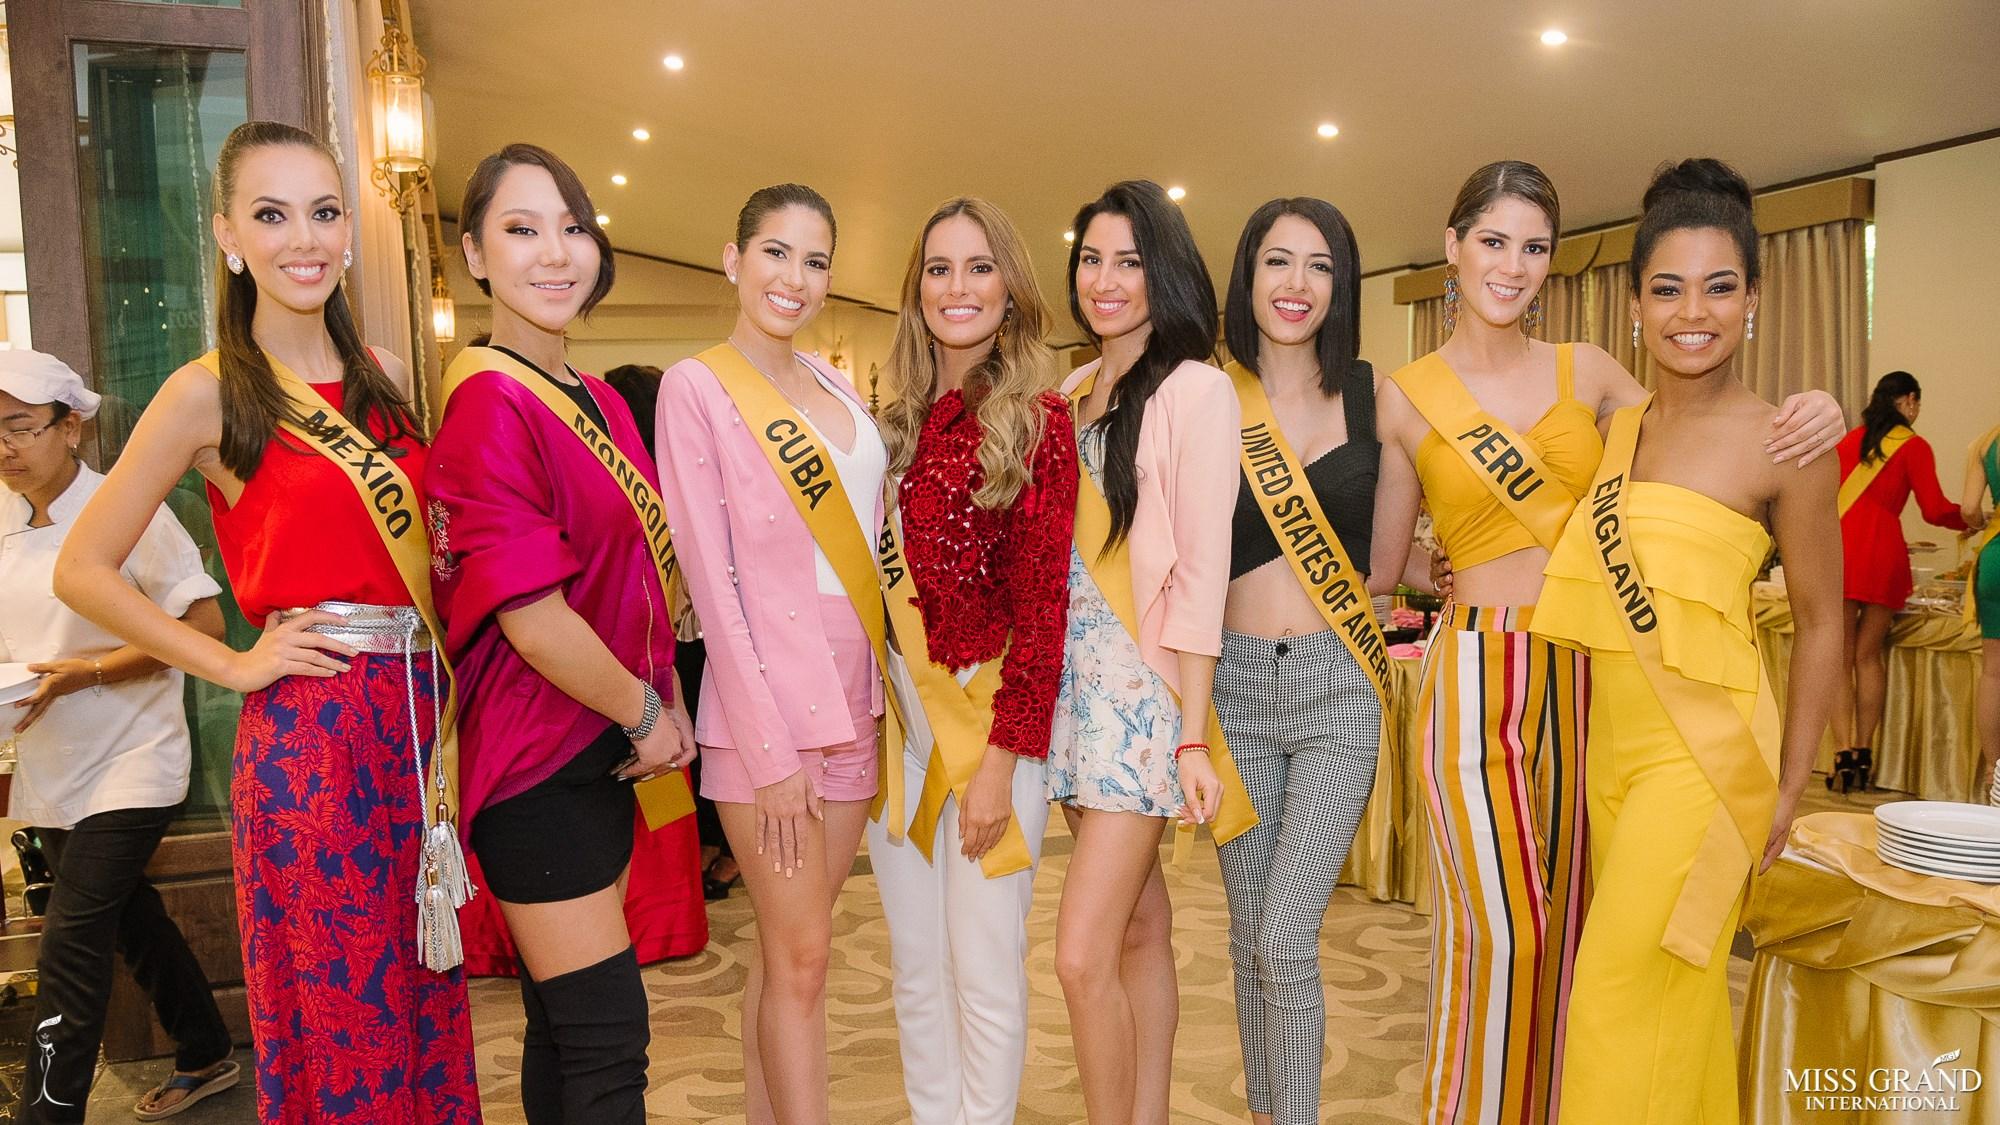 andrea moberg, top 20 de miss grand international 2018 (best national costume). - Página 10 G92qzr10